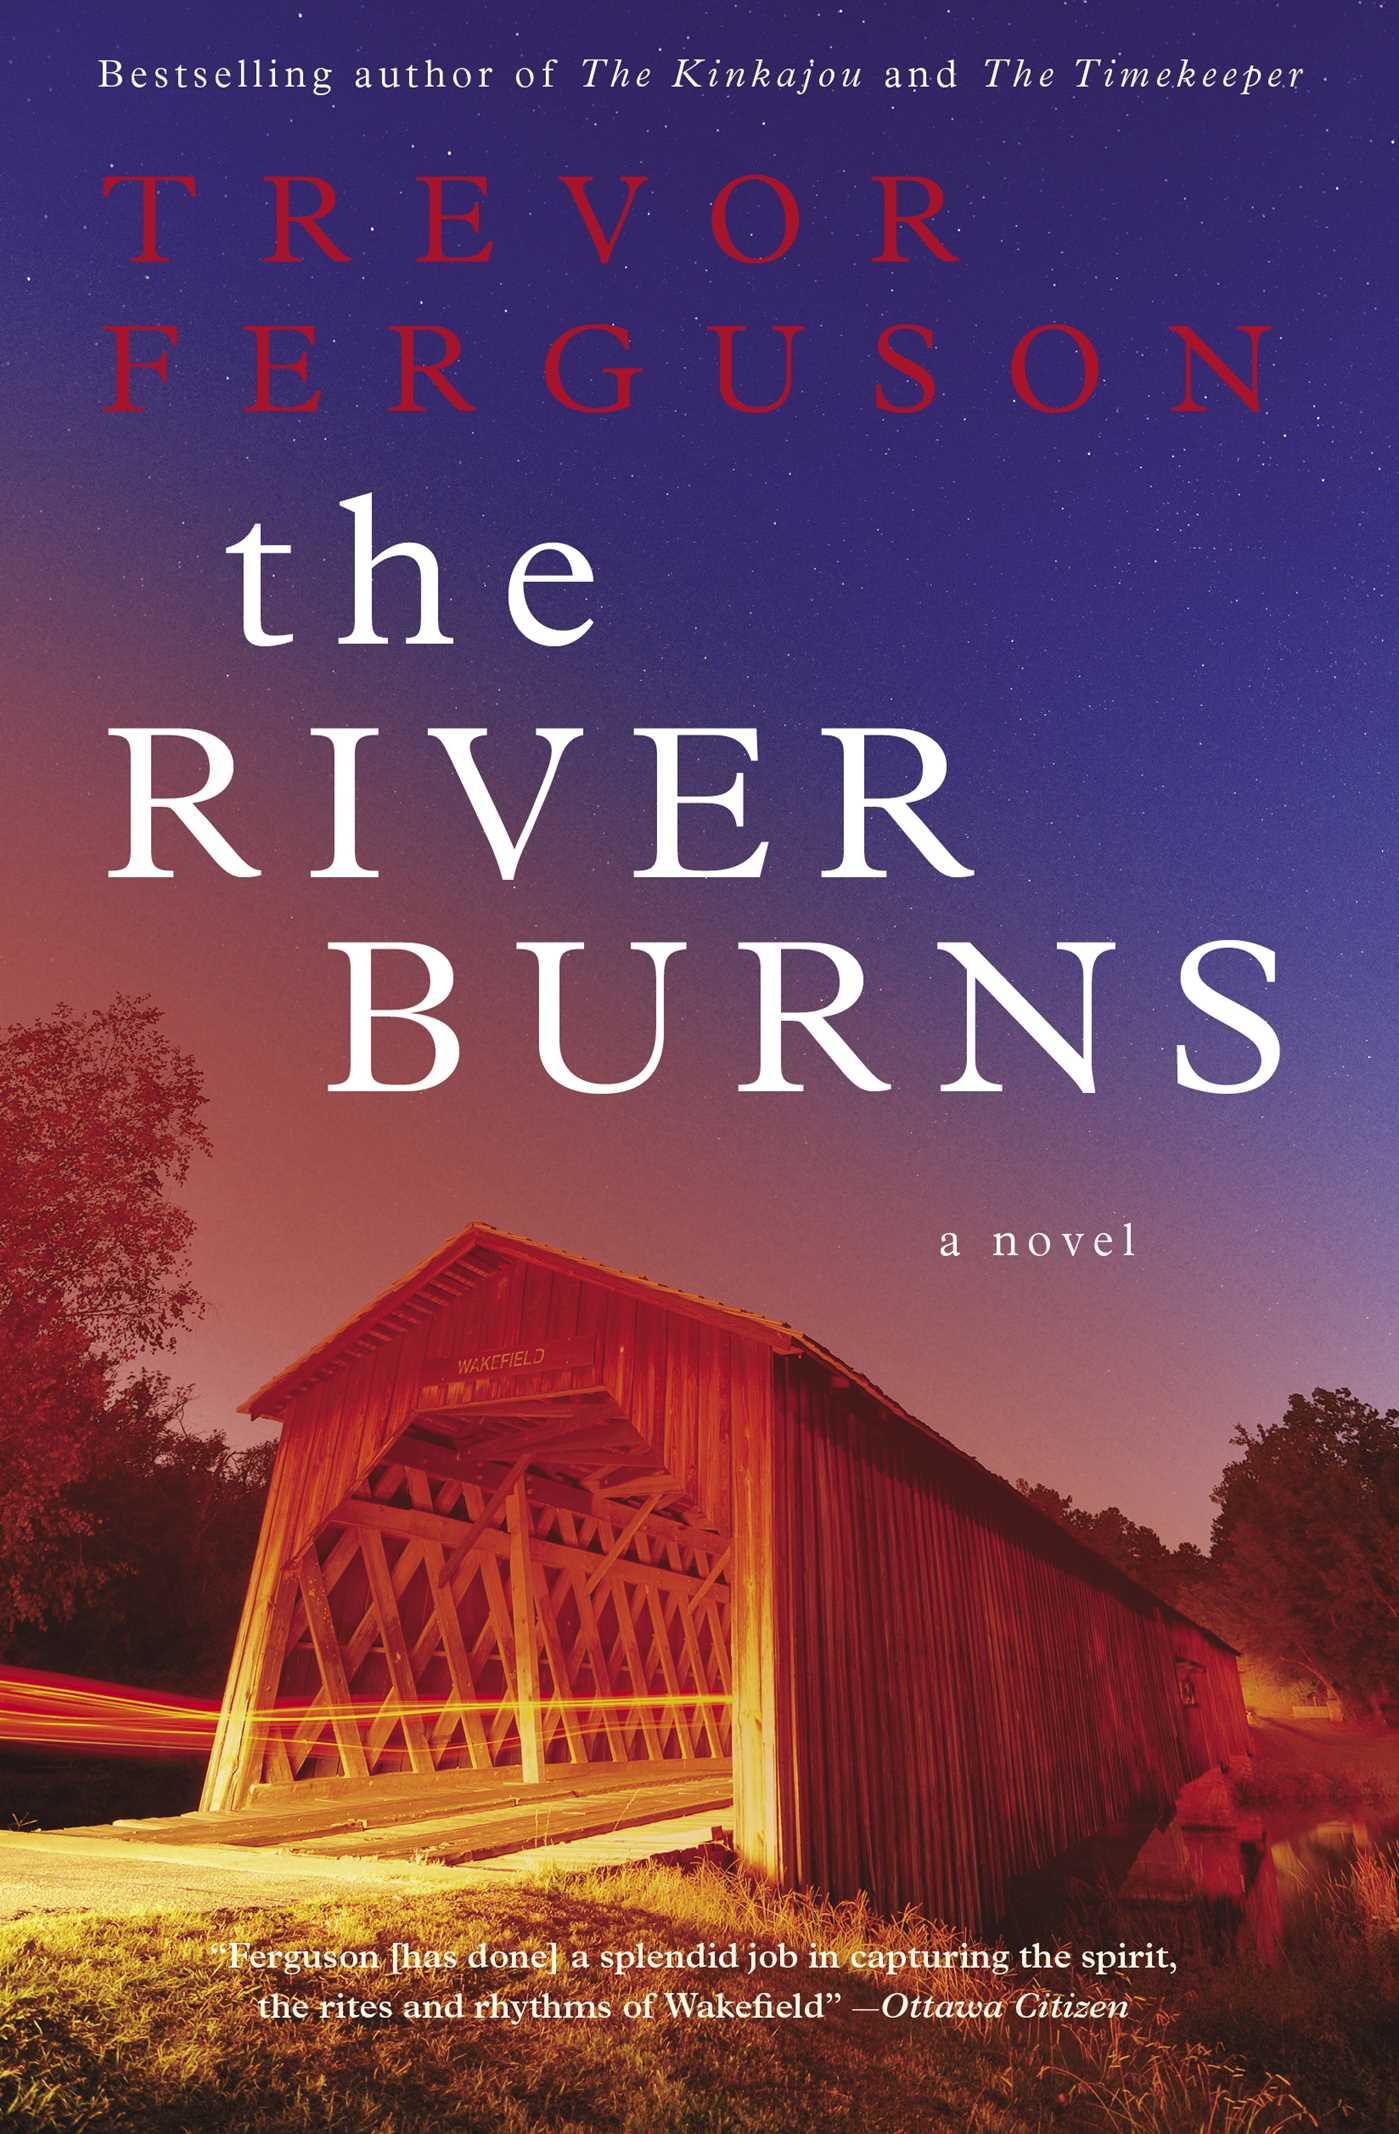 The river burns 9781476726380 hr